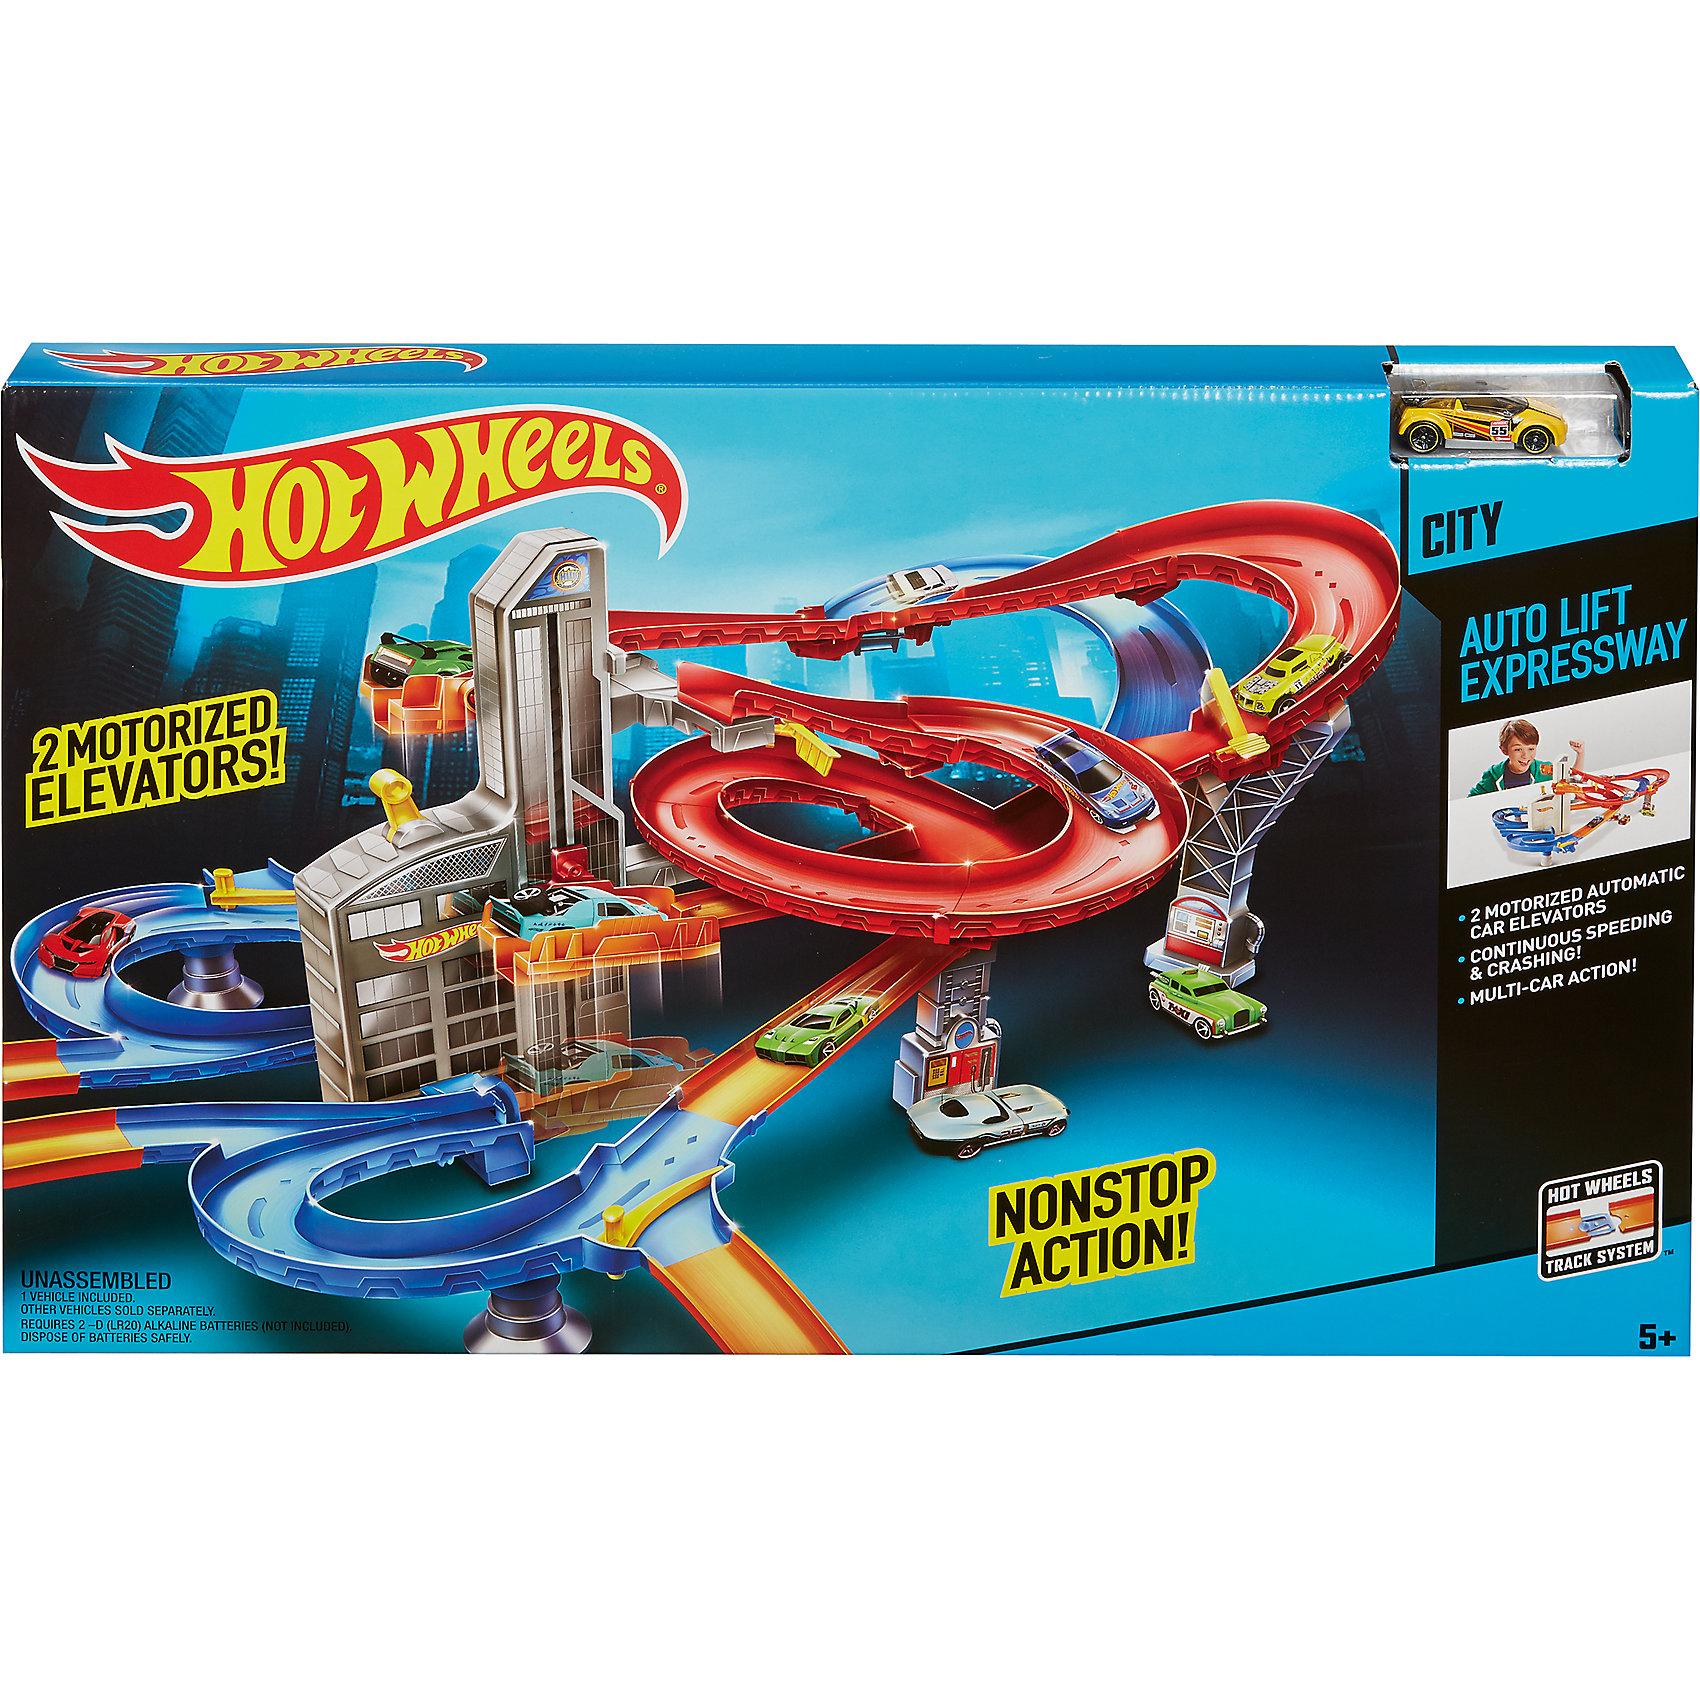 Mattel, Автотрек auto-lift expressway, hot wheels